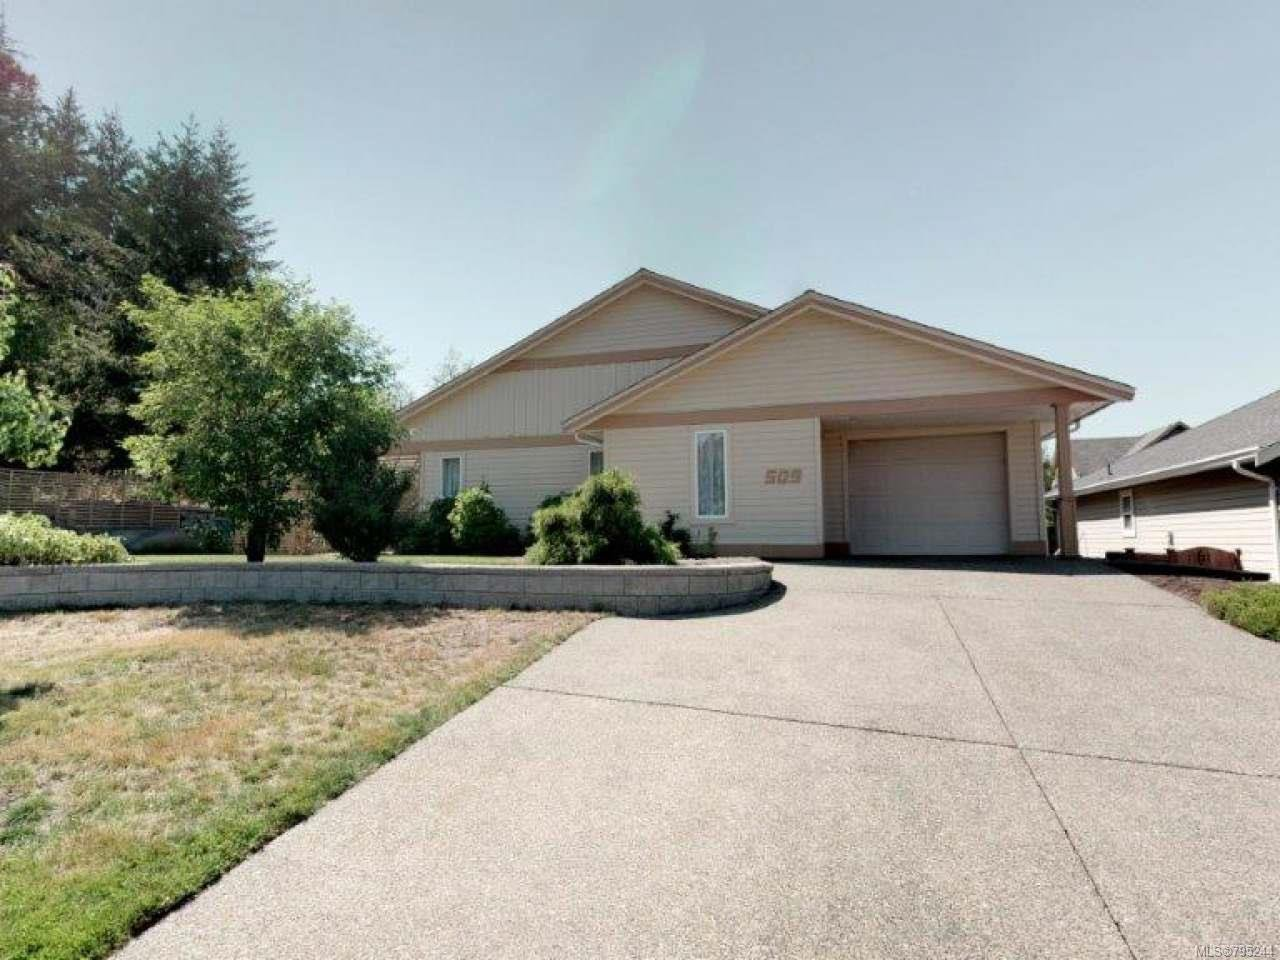 Main Photo: 509 CORFIELD STREET in PARKSVILLE: PQ Parksville House for sale (Parksville/Qualicum)  : MLS®# 795244